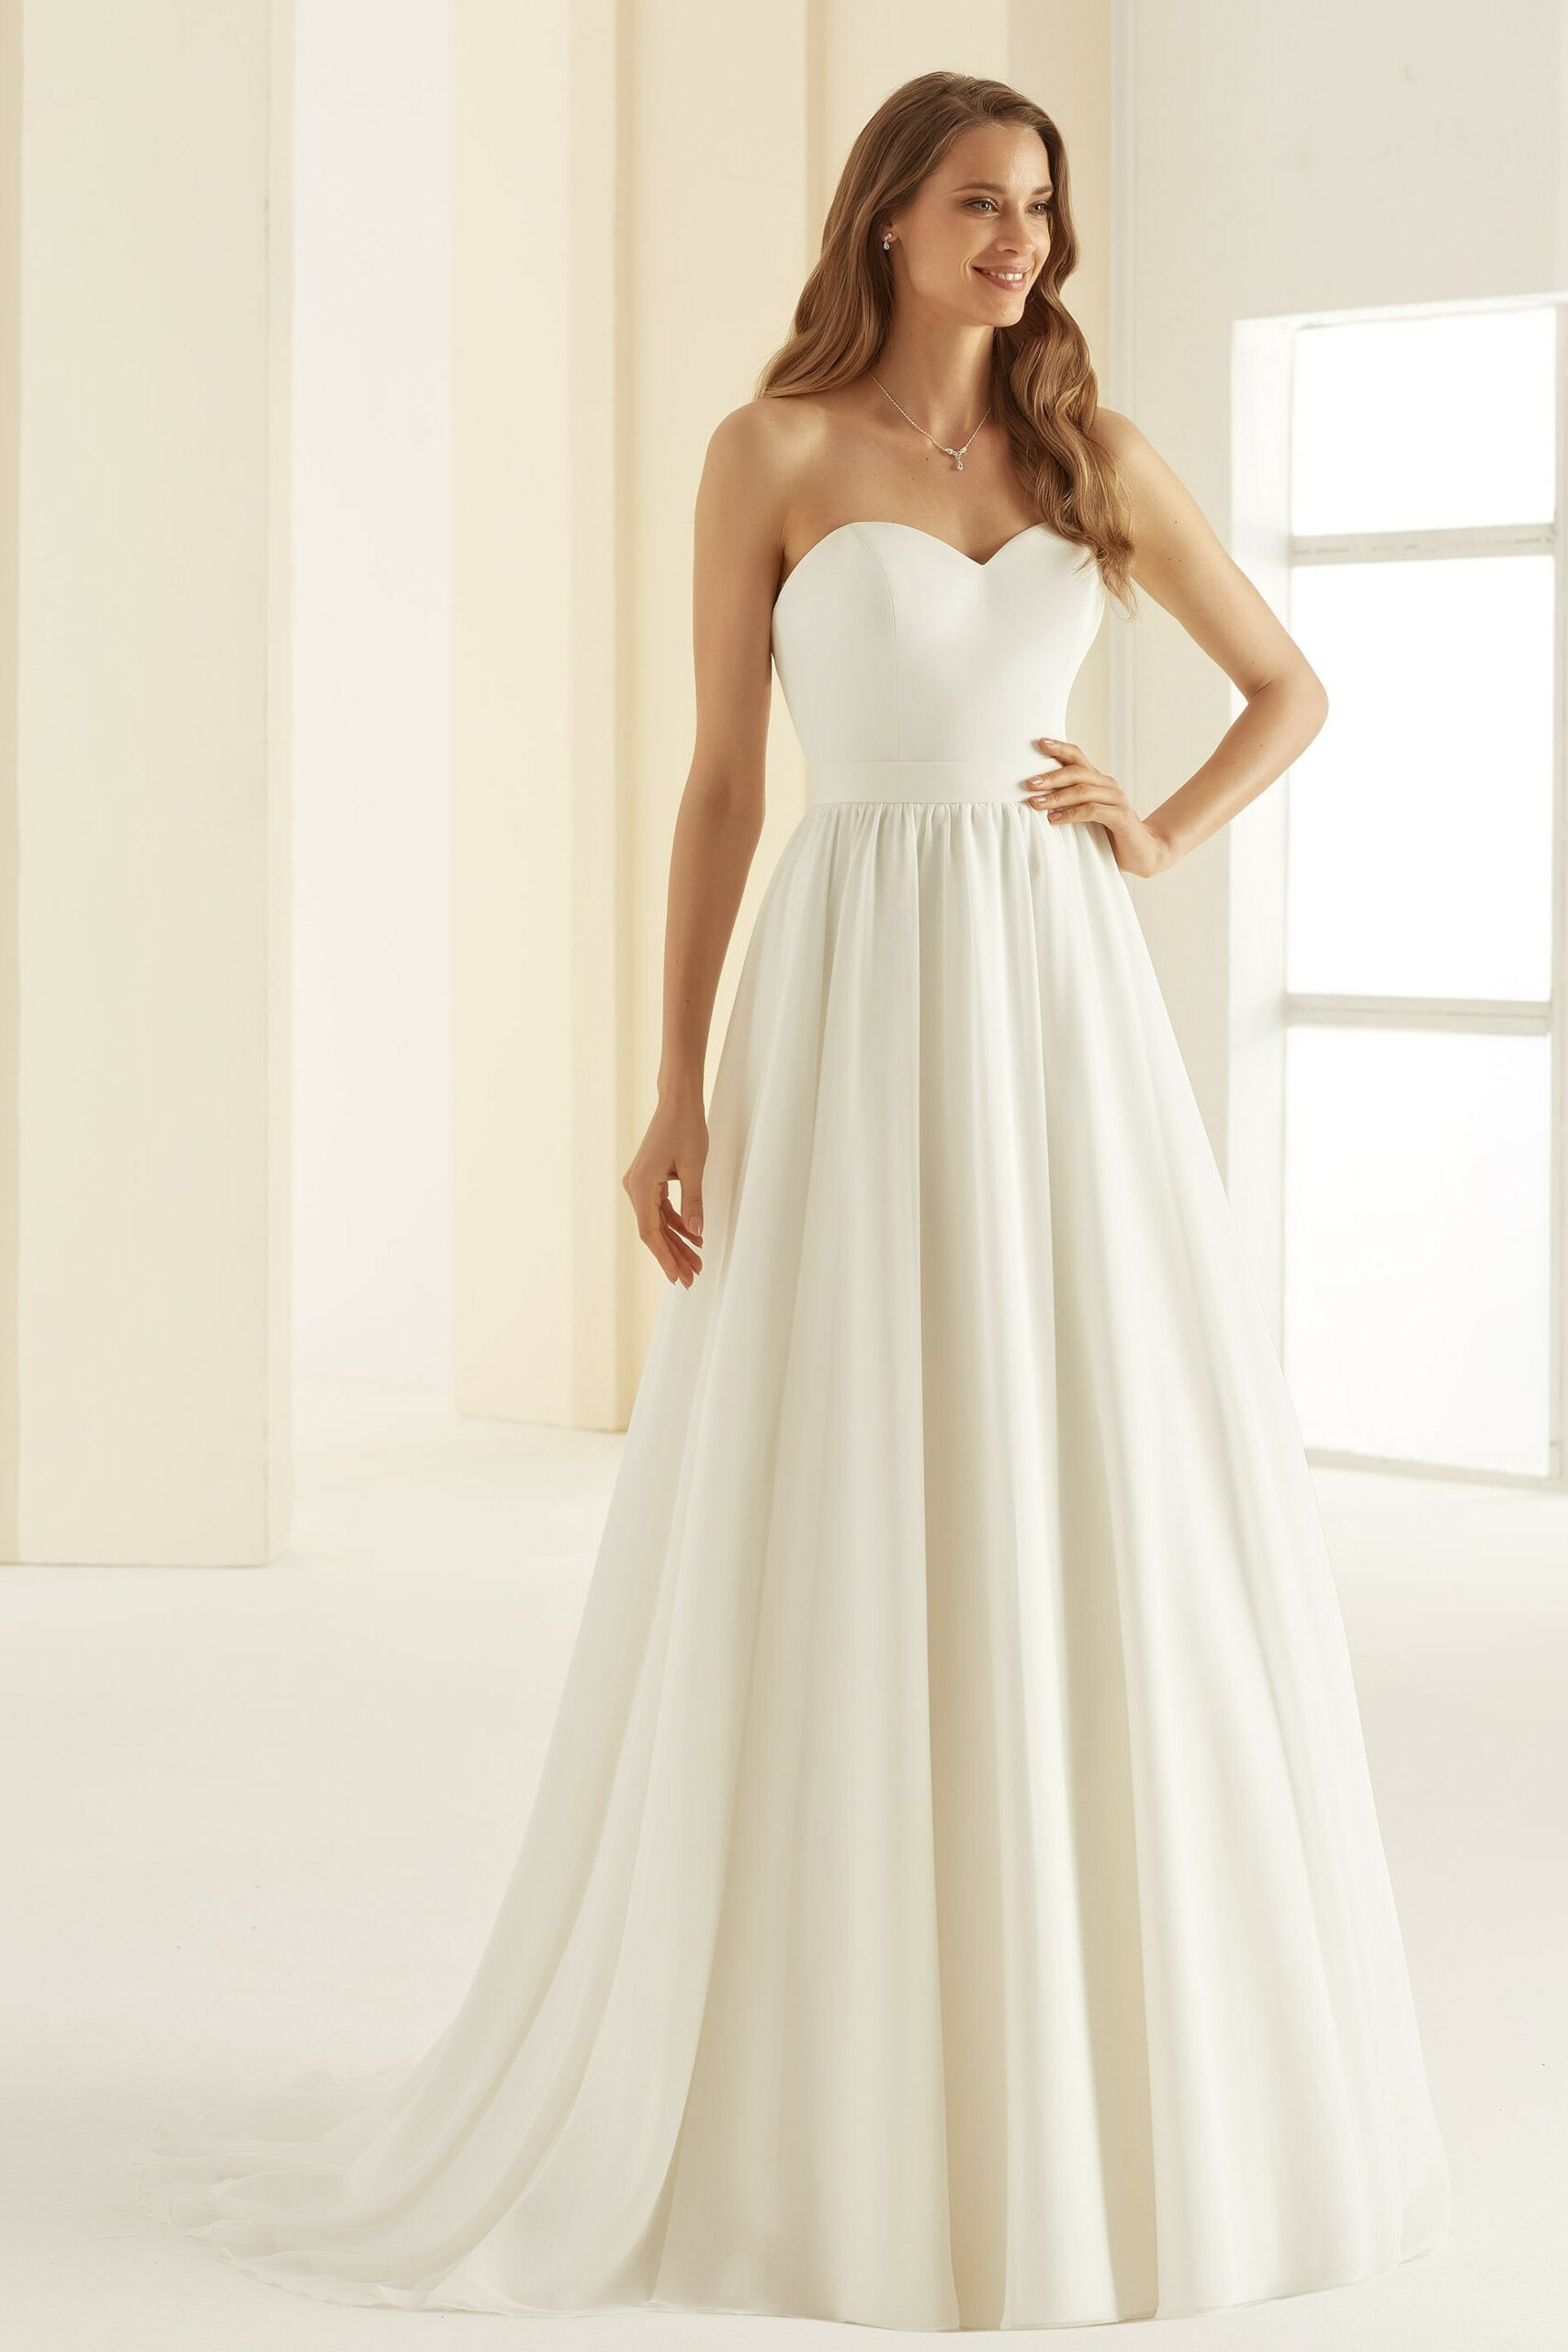 bianco-evento-bridal-separates_skirt-sardinia-_1__1